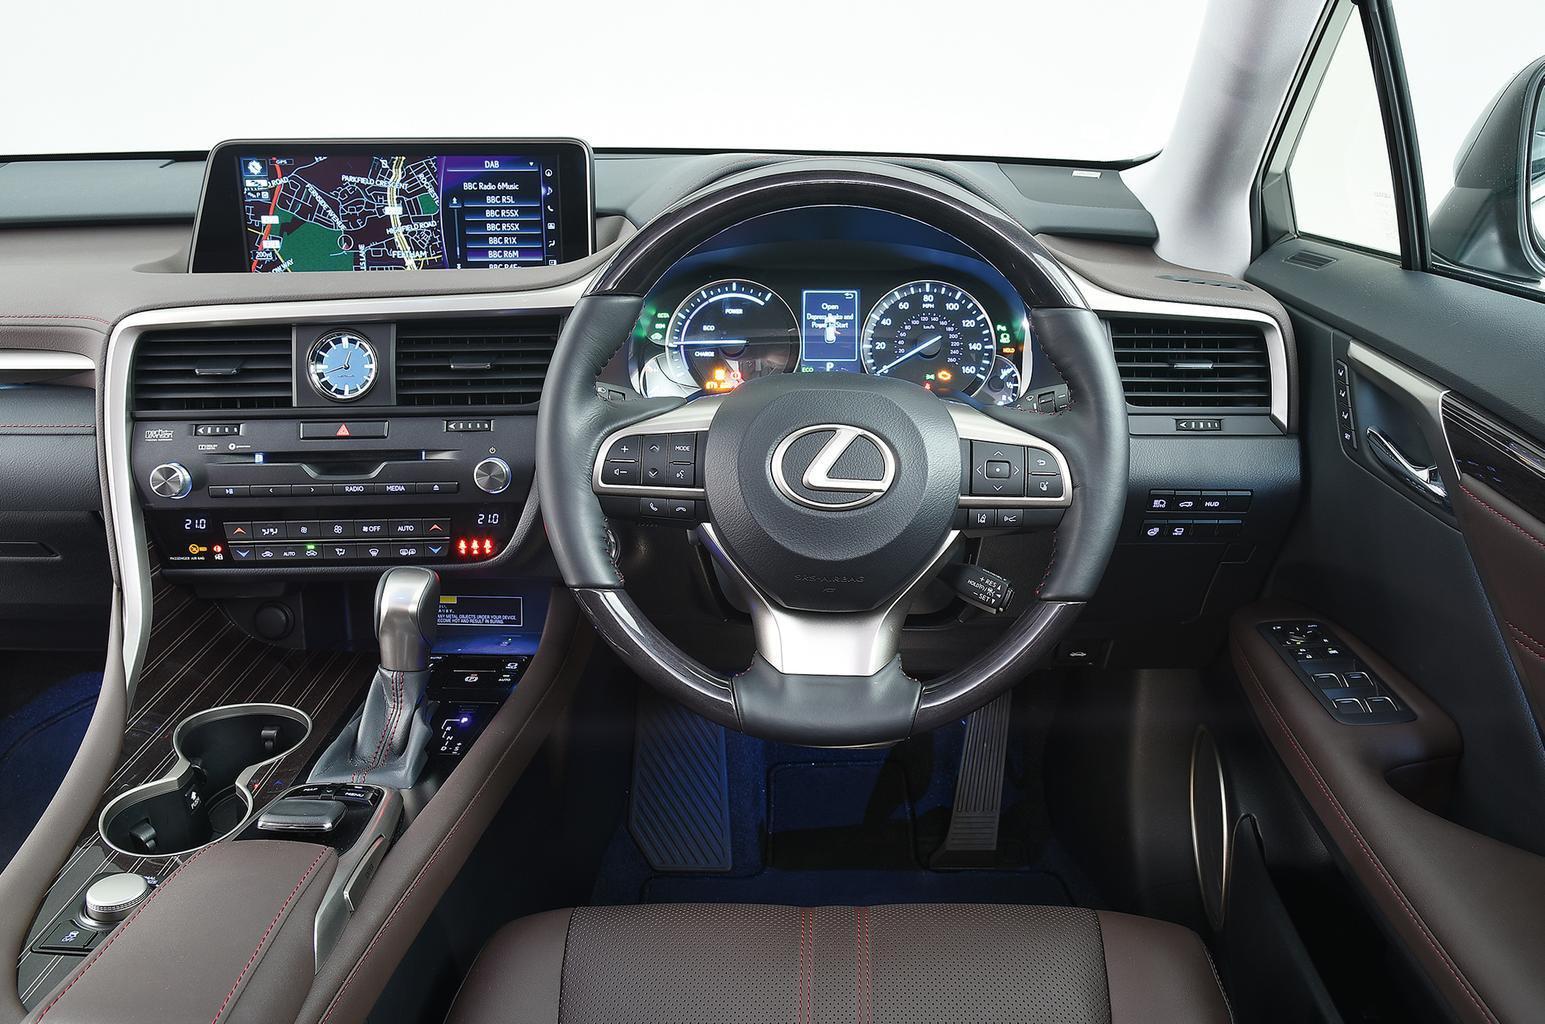 2018 Lexus RX 450h 3.5 Sport - interior